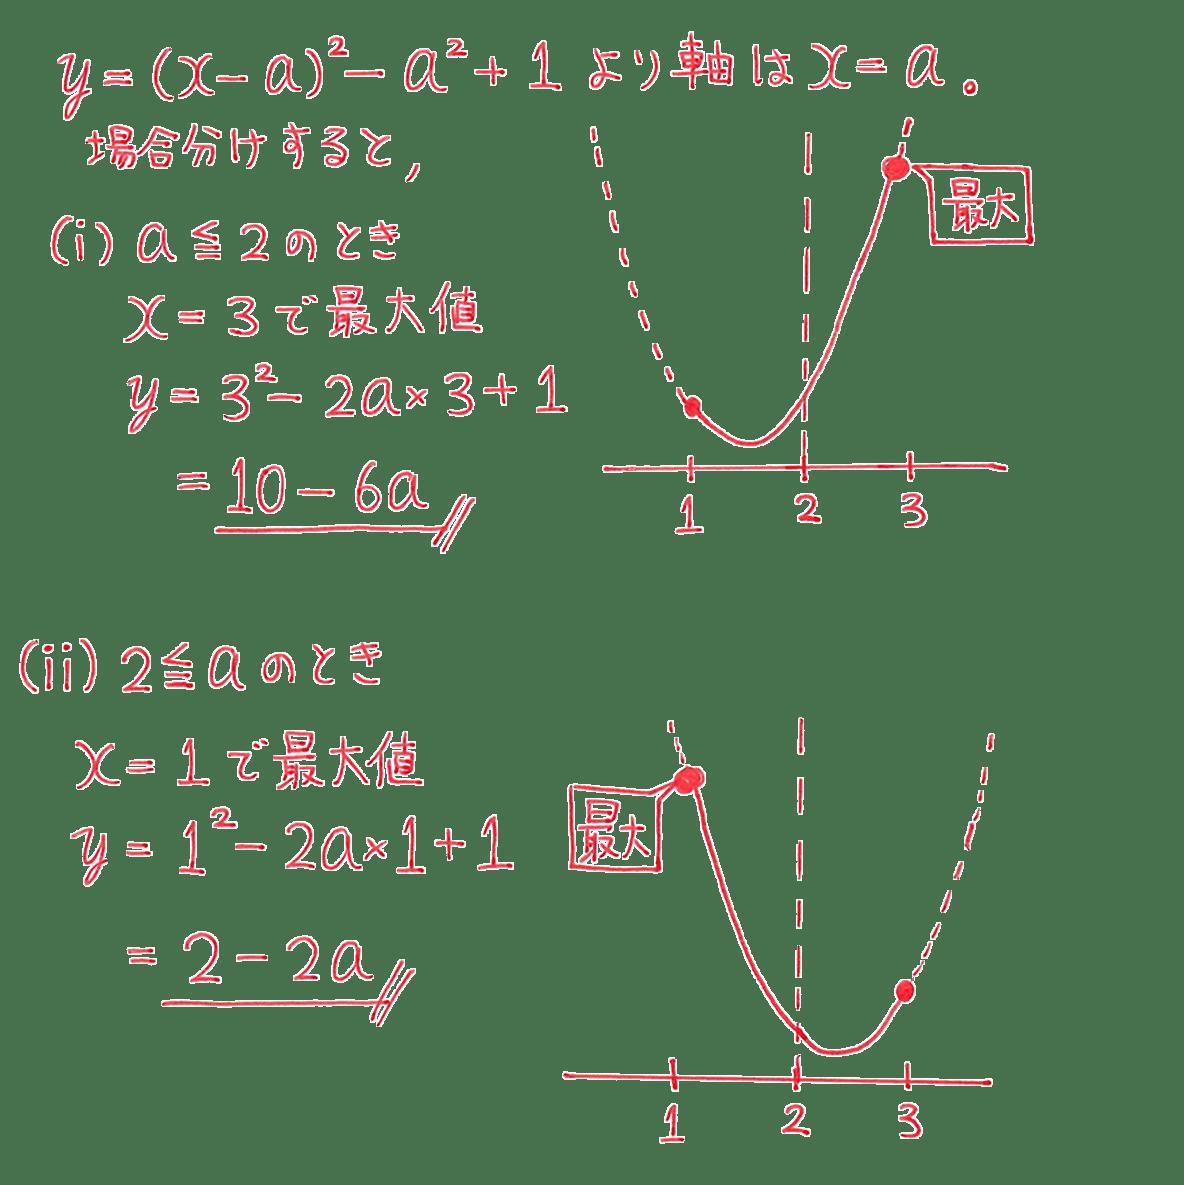 高校数学Ⅰ 2次関数24 練習の答え